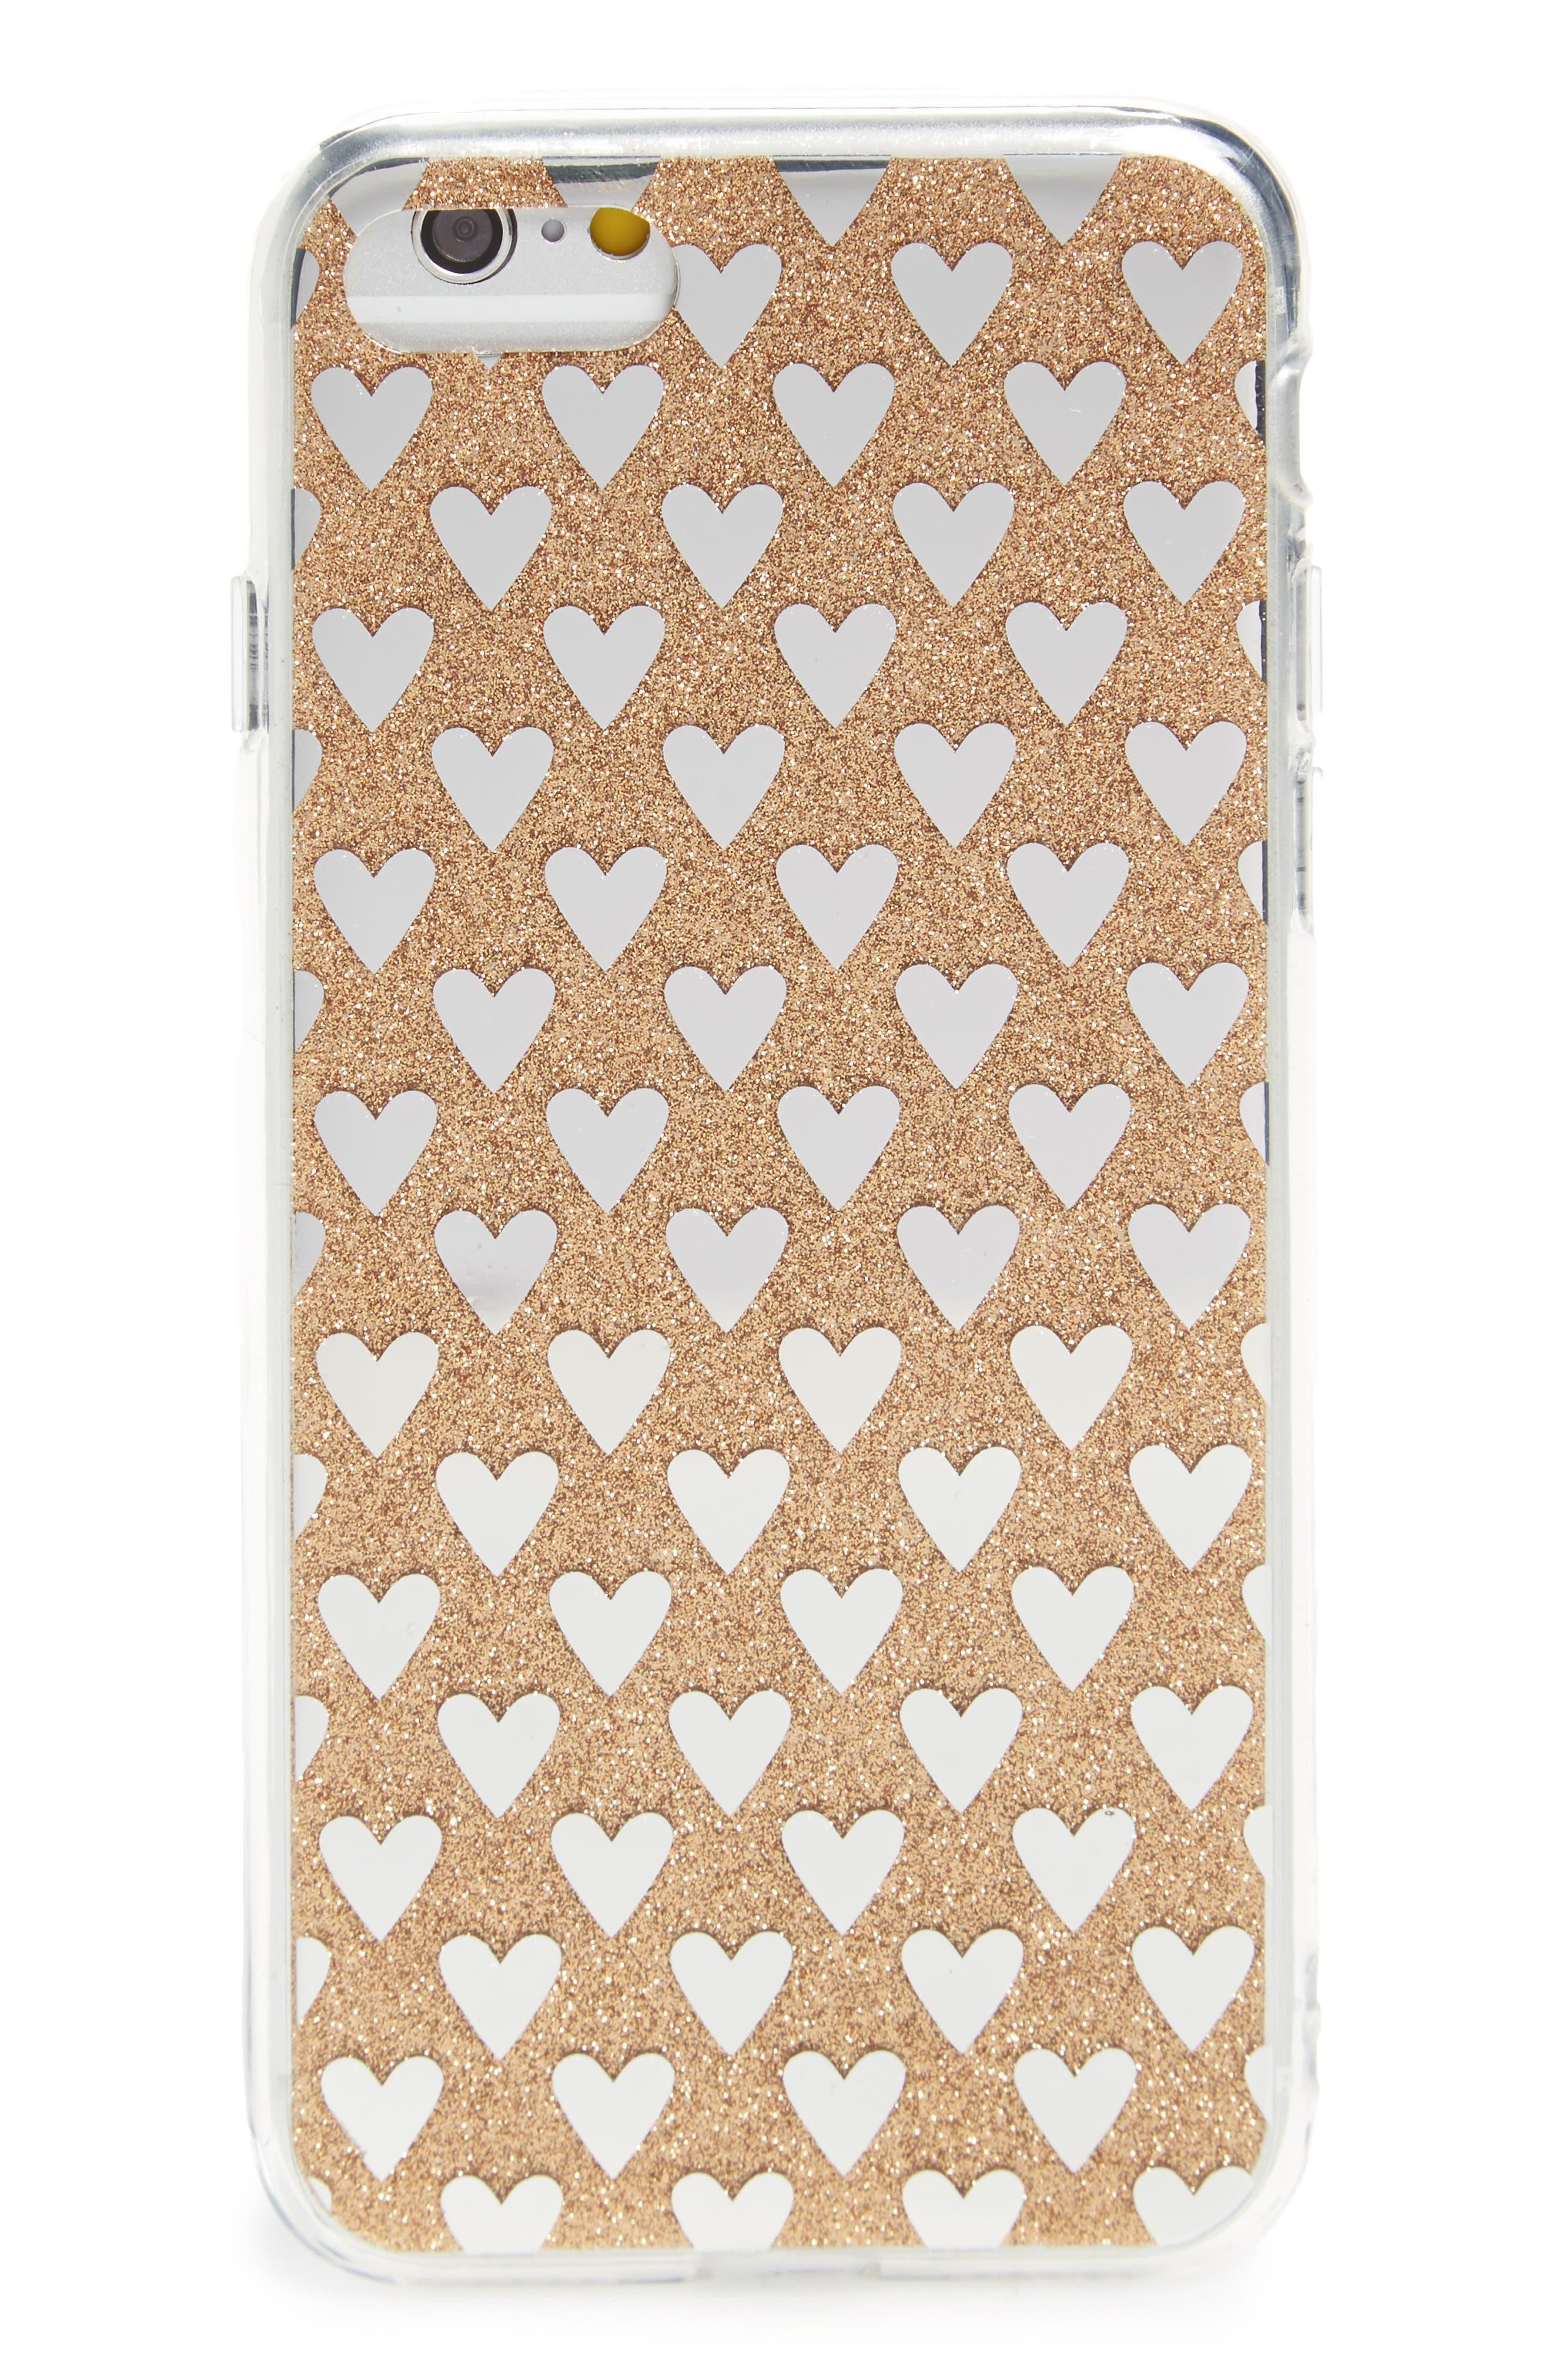 Main Image - OK originals Transparent Glitter Heart iPhone 6/6s/7 Case